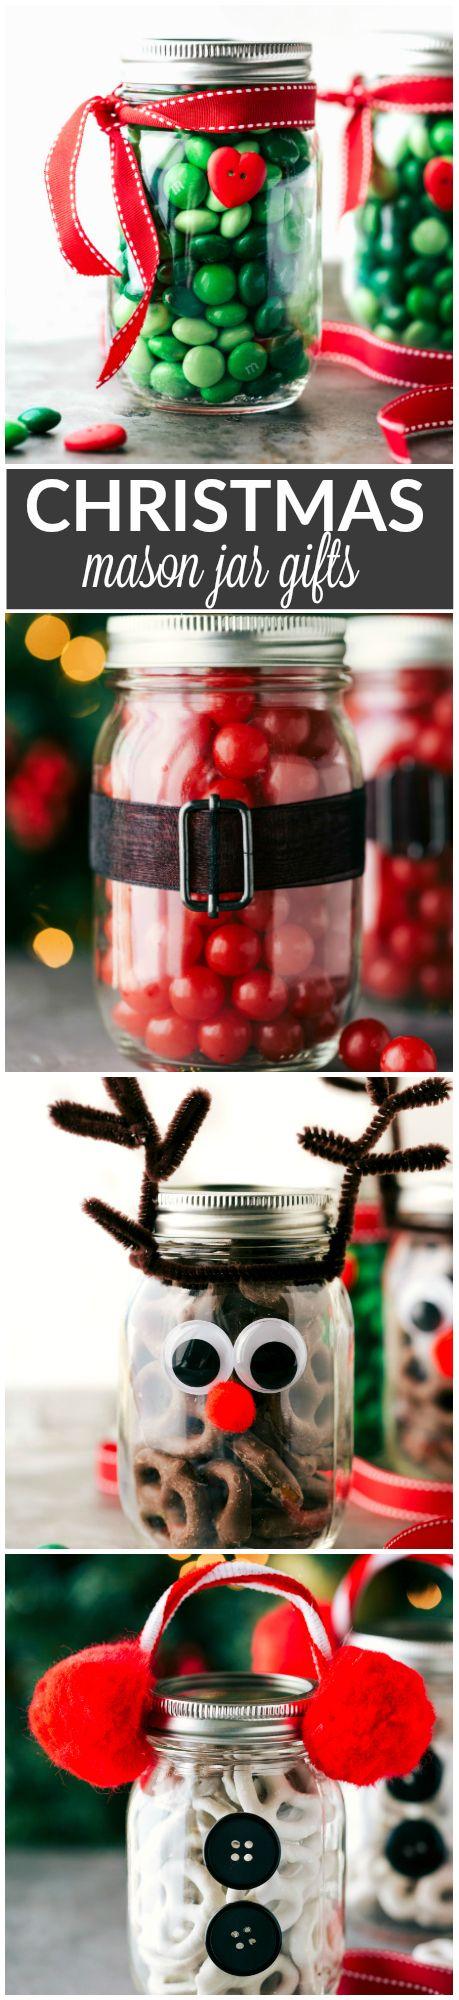 Christmas Mason Jar Gift Ideas